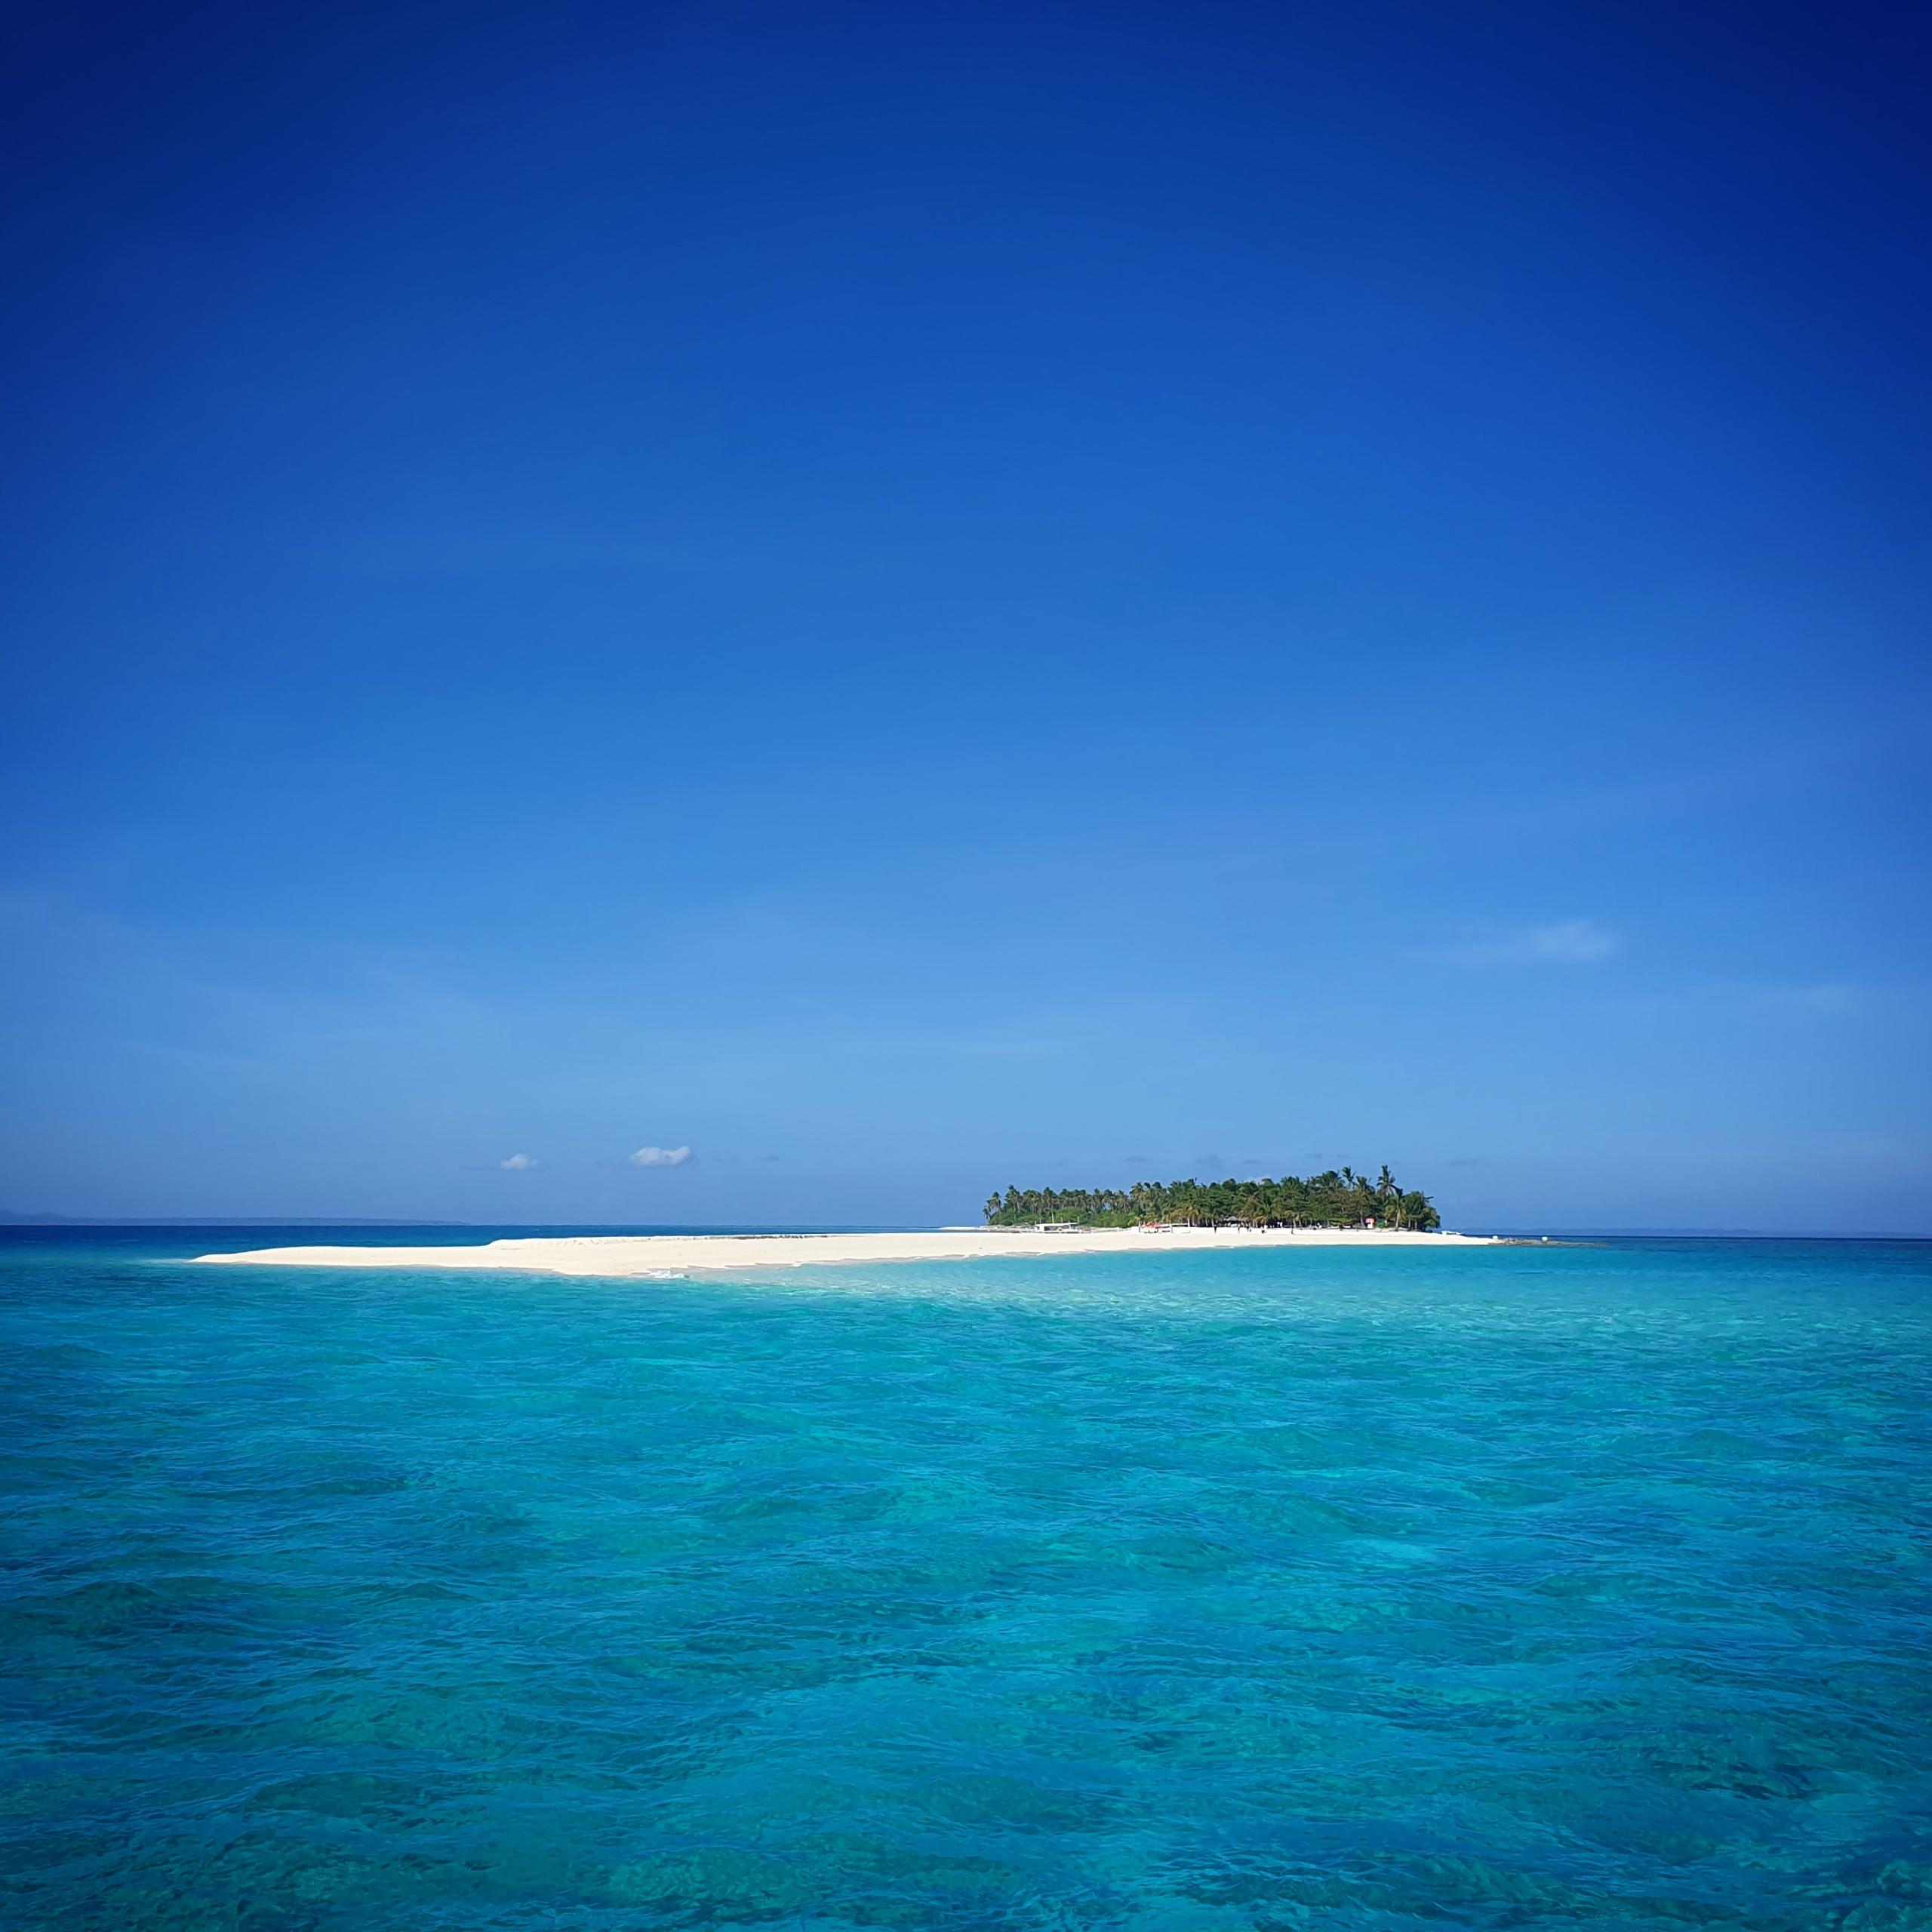 Isola di Malapasqua, Olgiata Diving Febbraio 2020, People 31